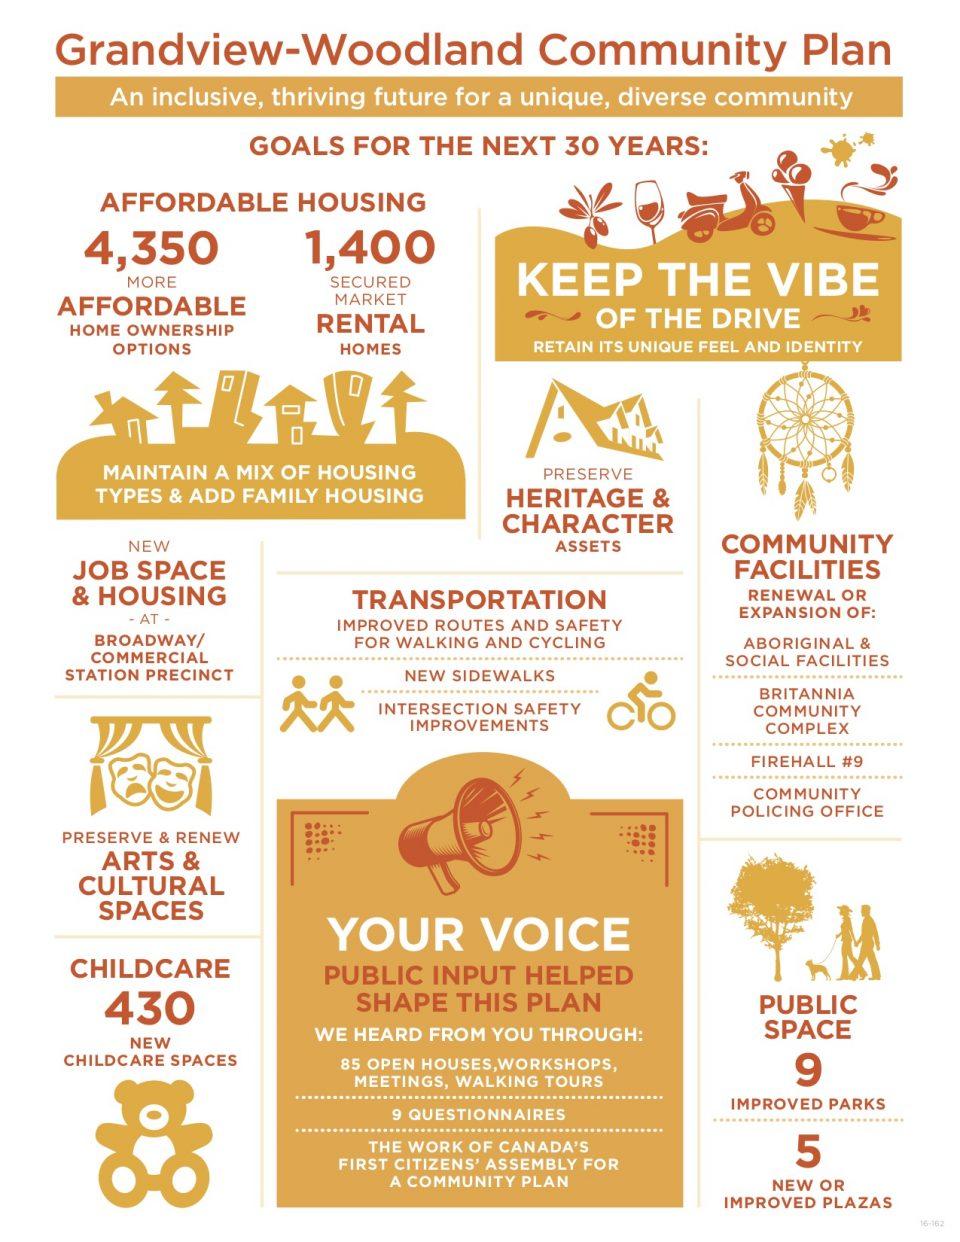 Grandview-Woodland Community Plan infographic